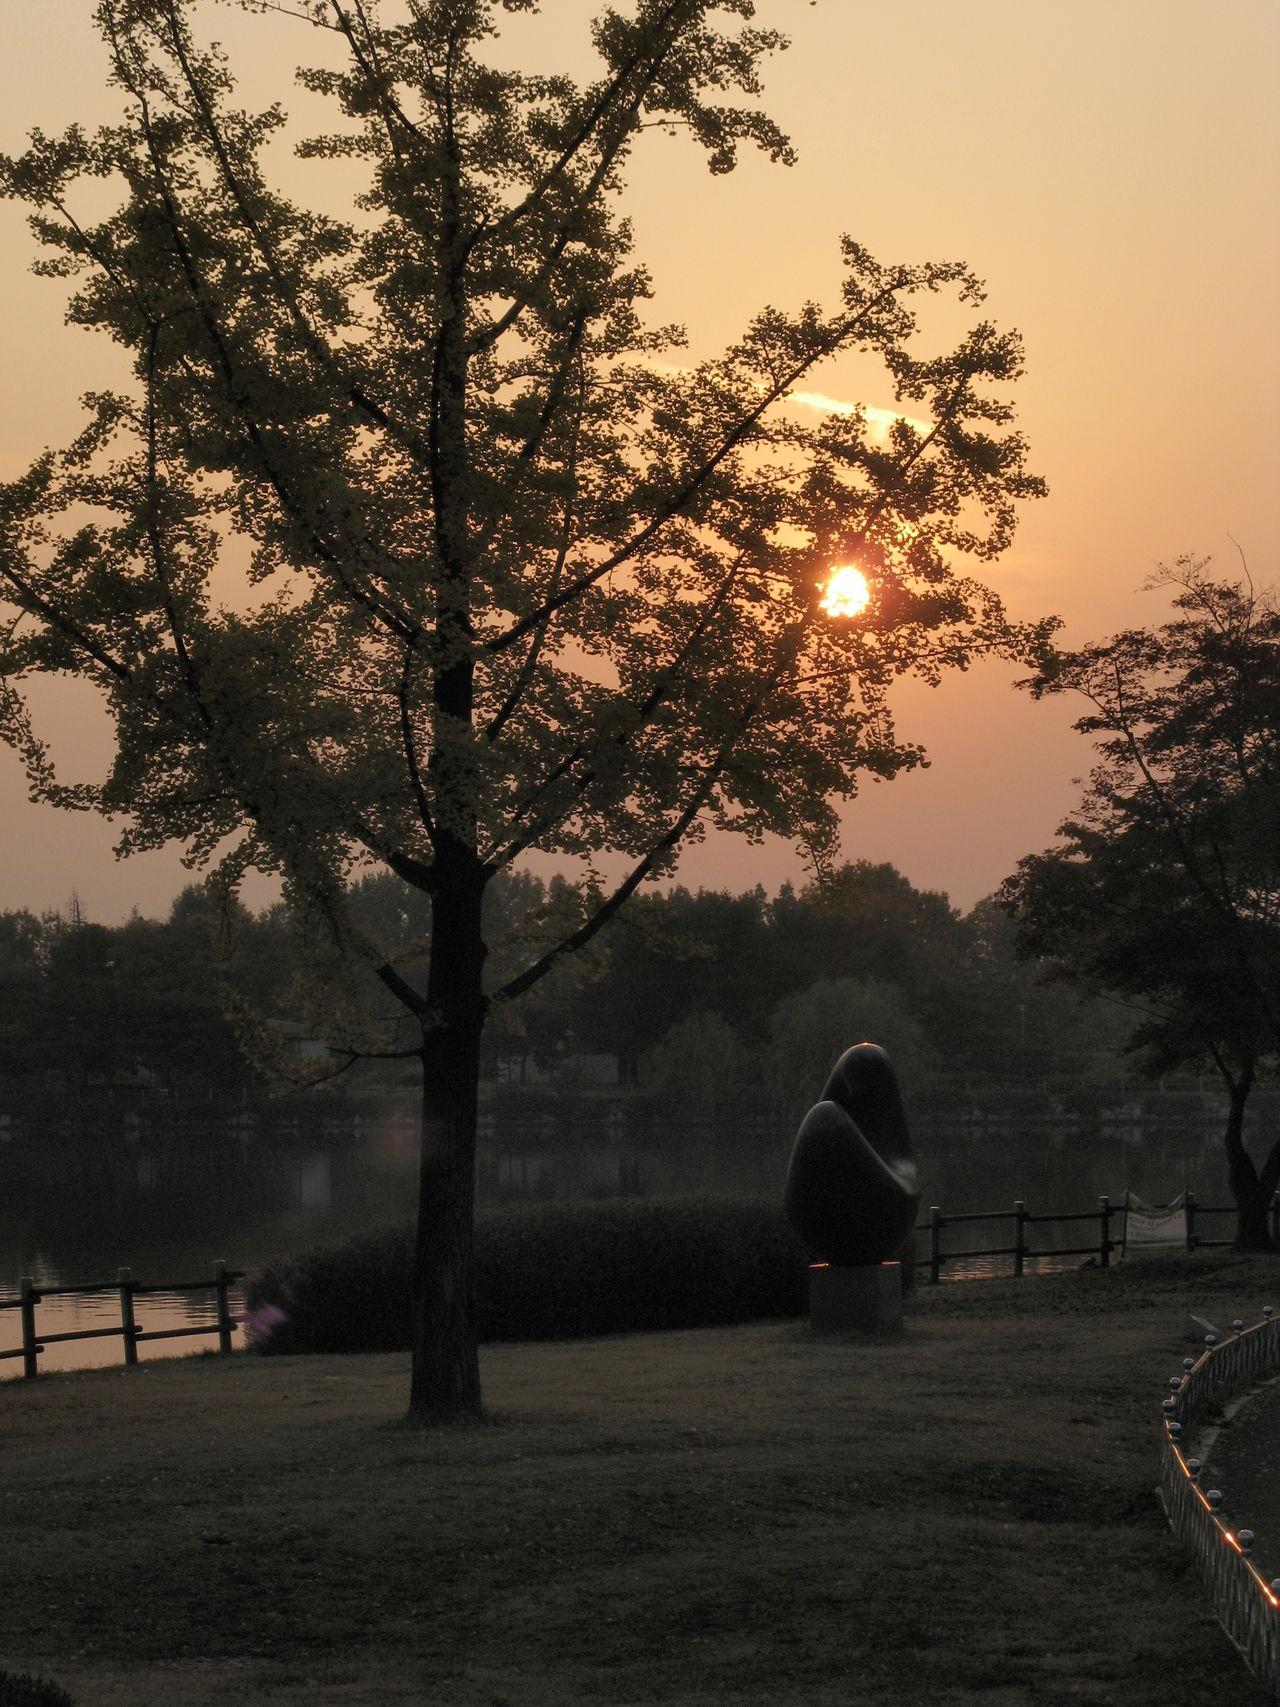 a tree and sun Tree Sun Scenics Beauty In Nature Field 365